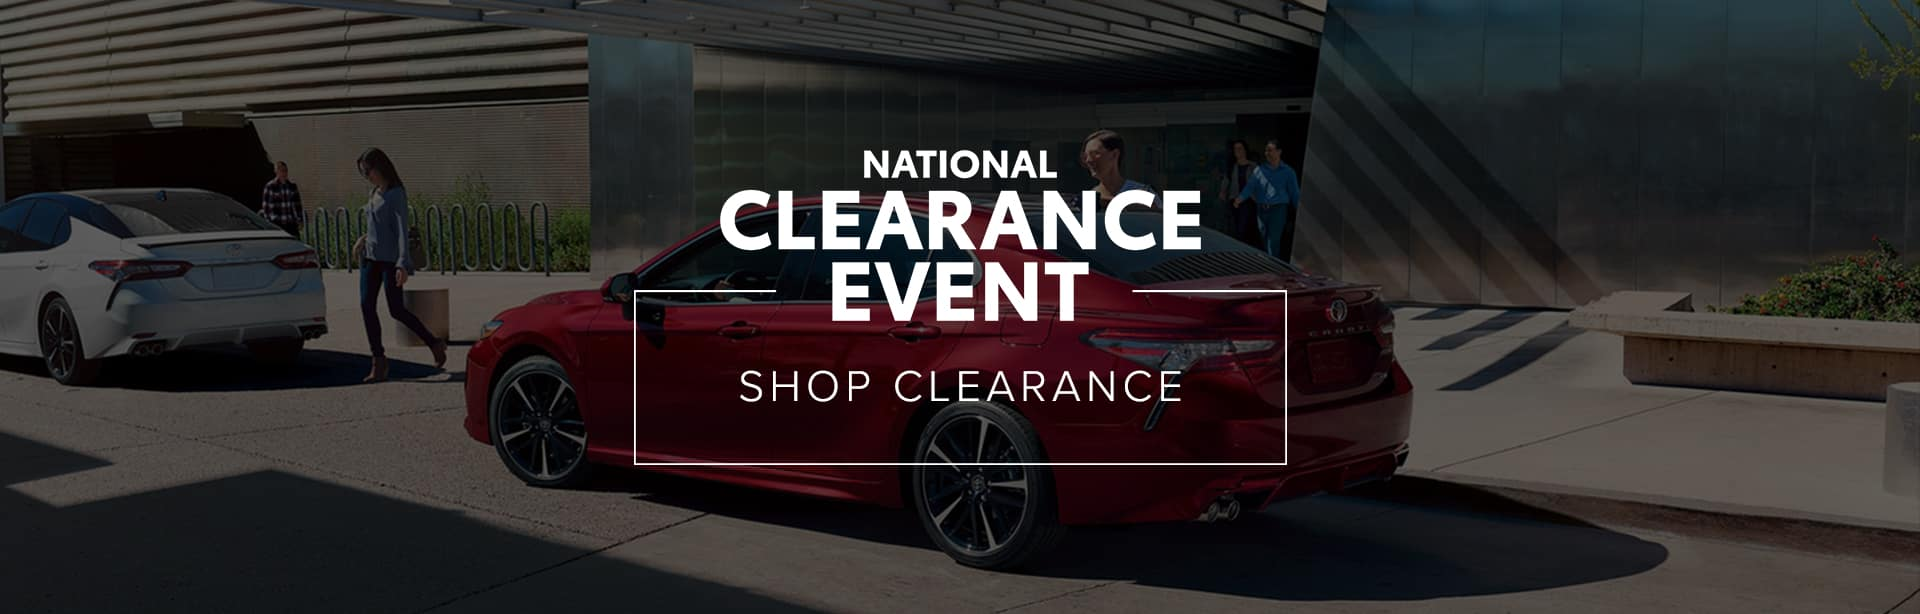 earl stewart toyota national clearance event